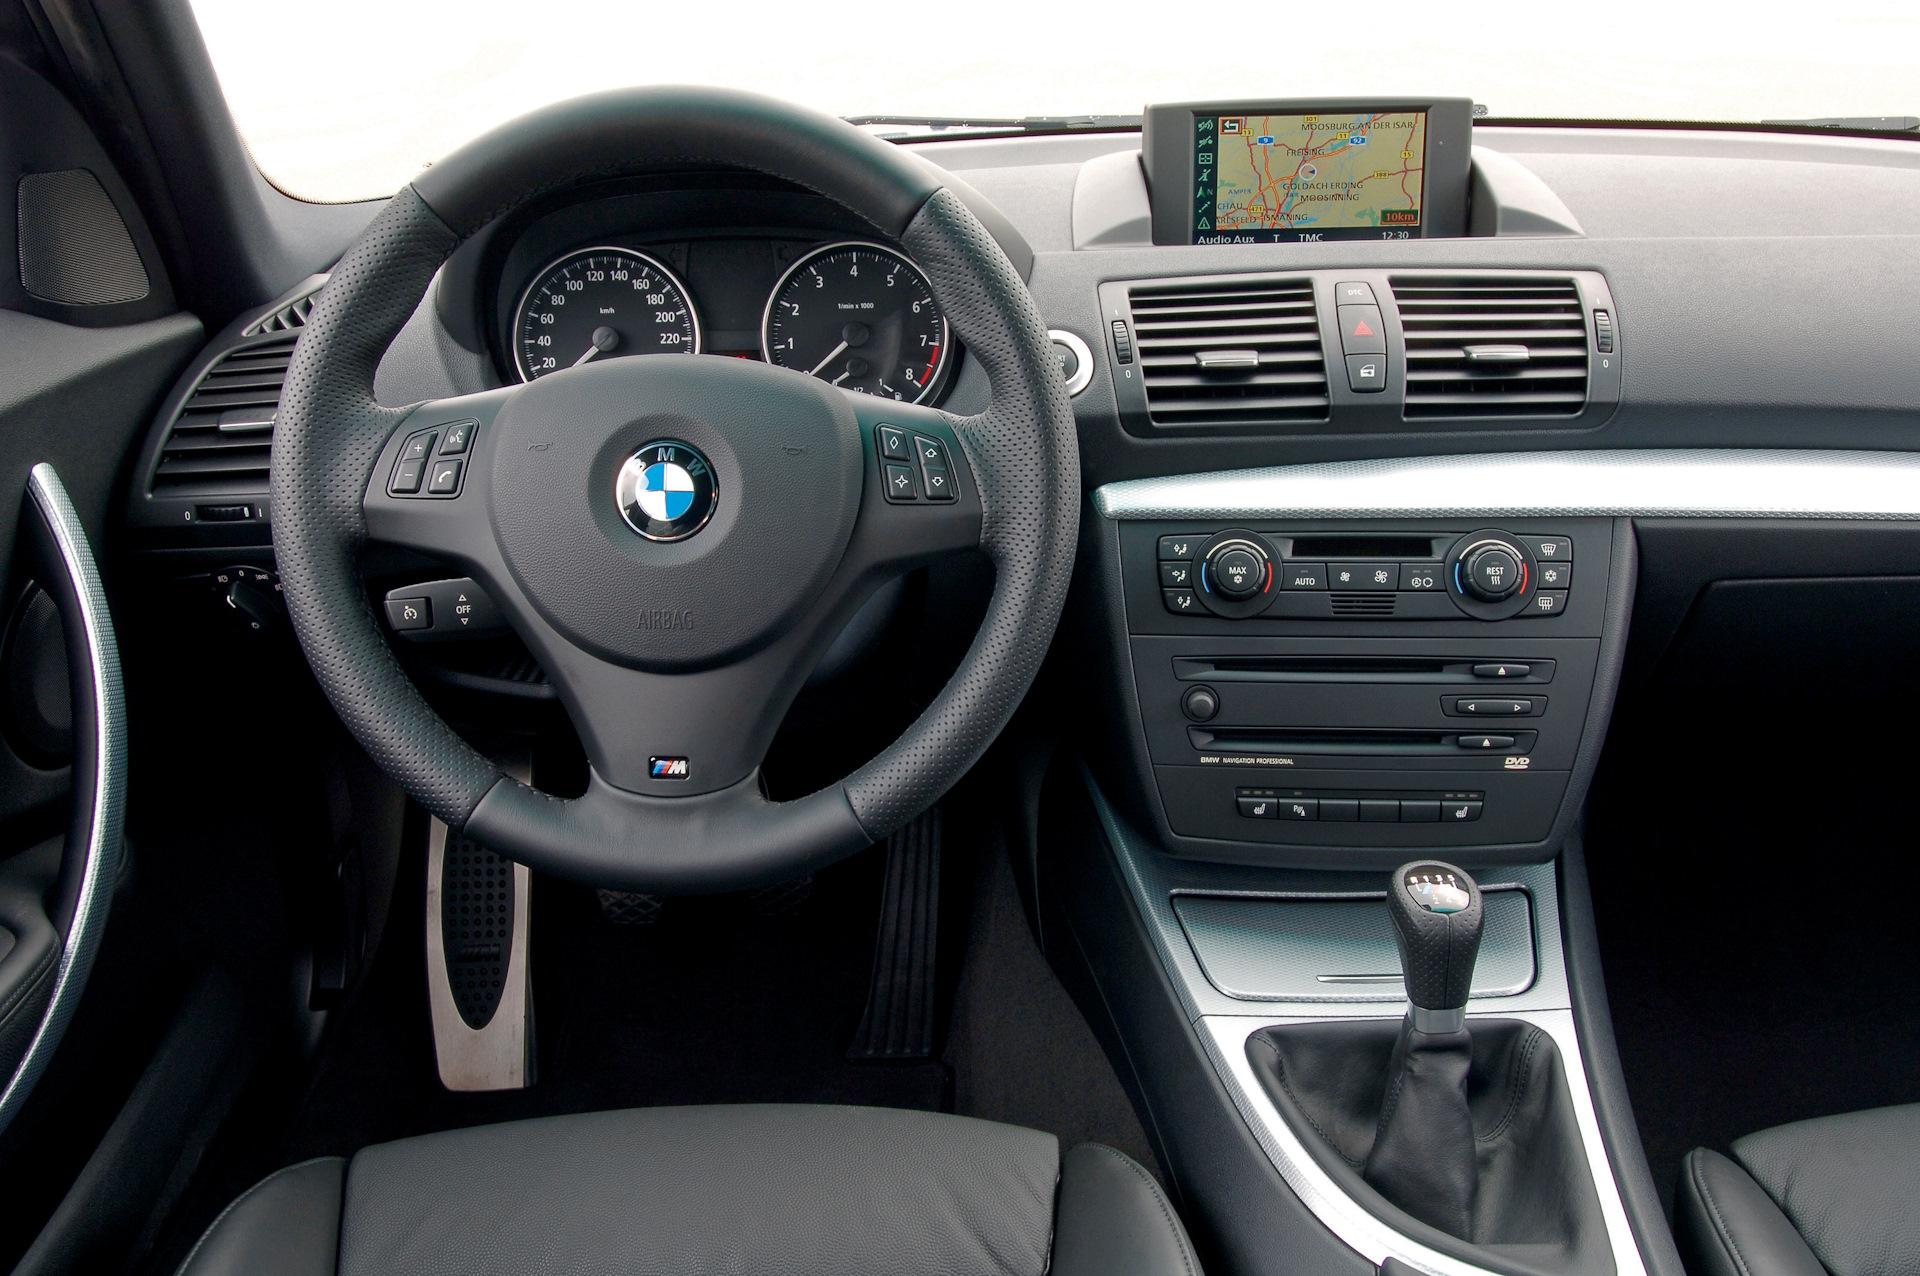 Замена головного устройства BMW 1-Series Е87 Business на Professional